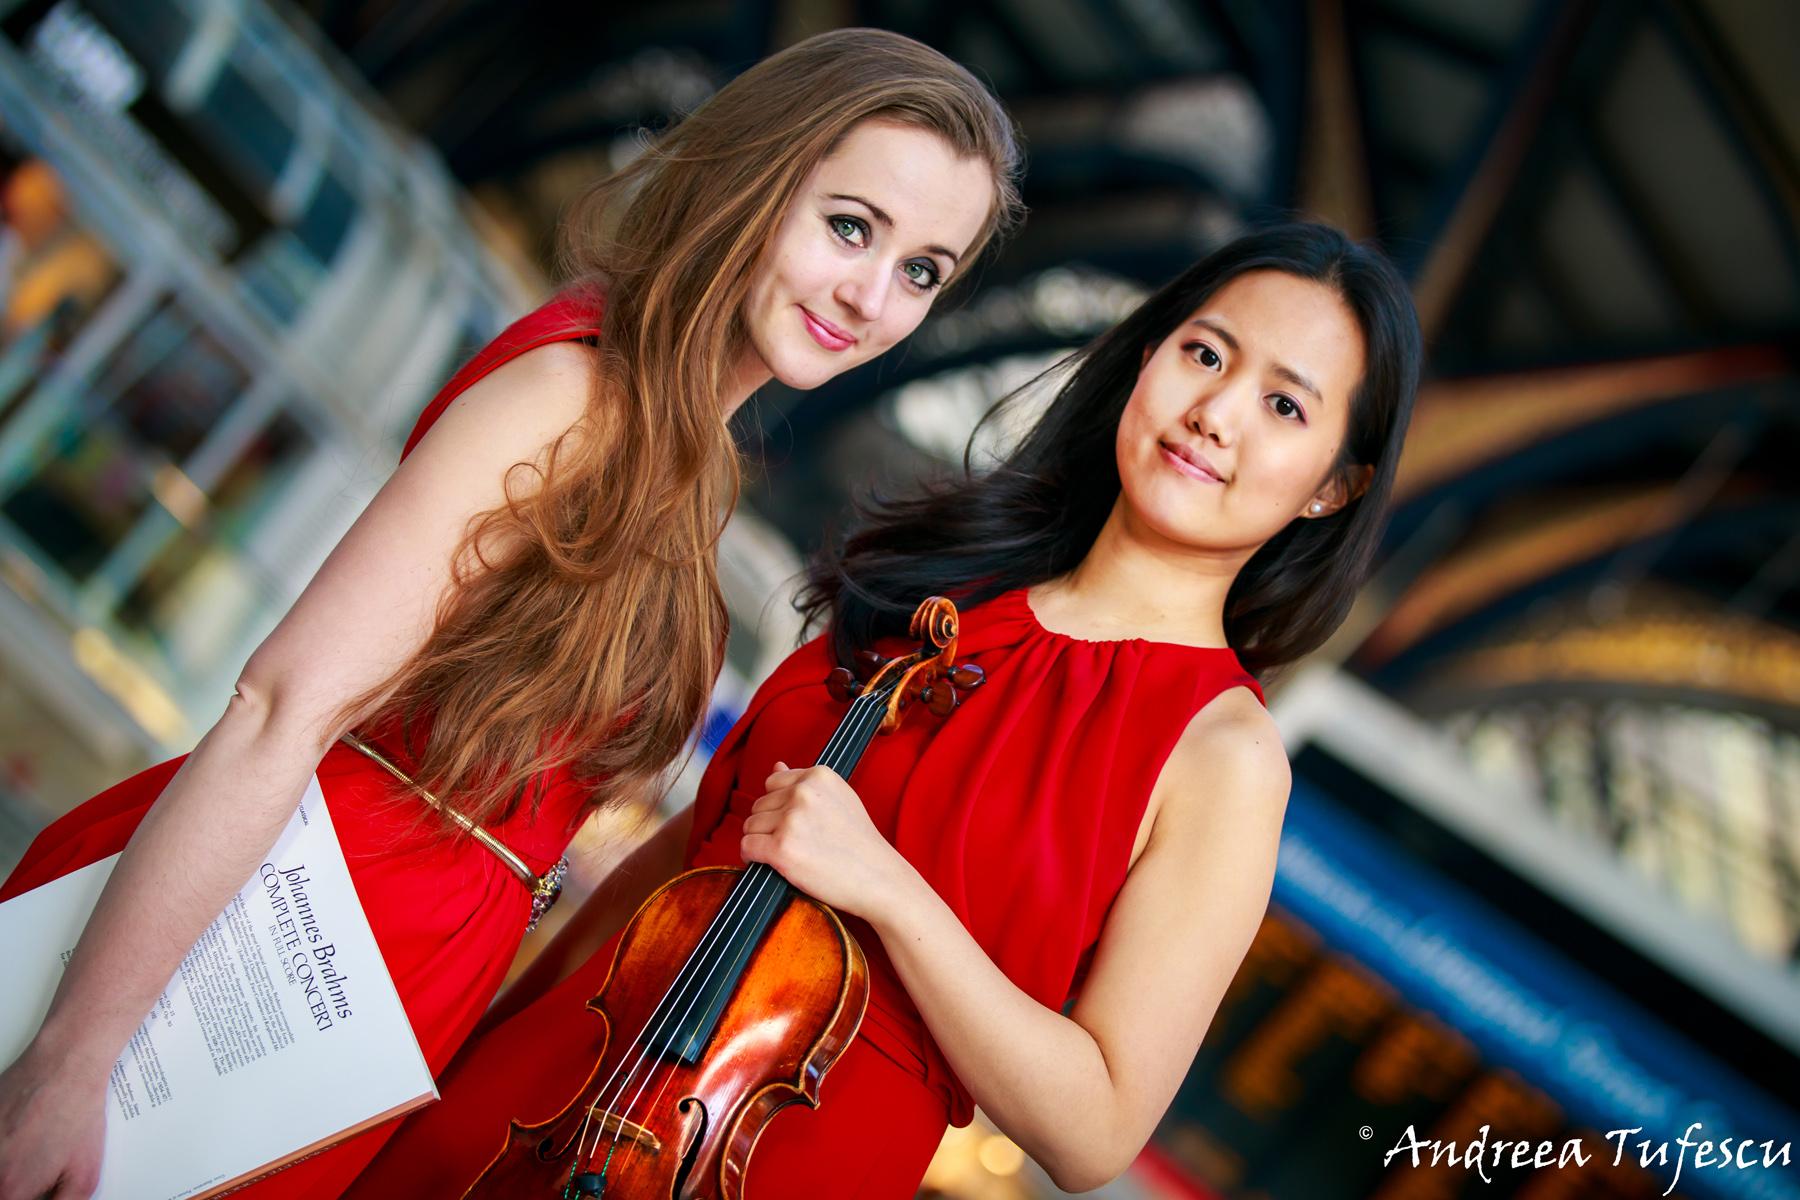 Pianist Oxana Shevchenko and Violinist JooYeon Sir - group portraits and headshots by London photographer Andreea Tufescu